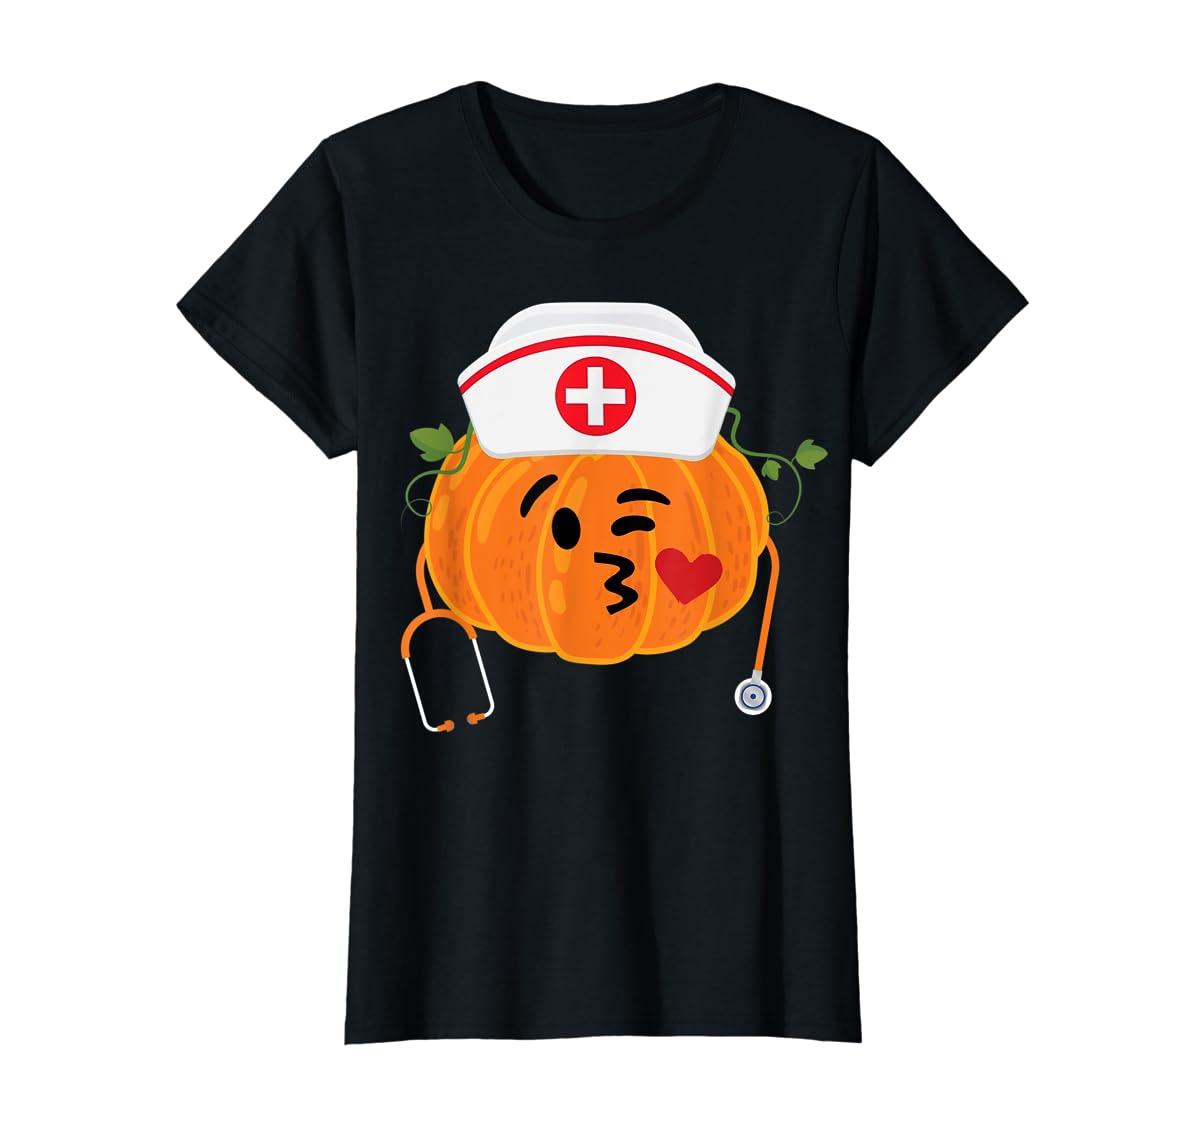 Nurse Stethoscope Pumpkin Funny Nursing Halloween Gift T-Shirt-Women's T-Shirt-Black